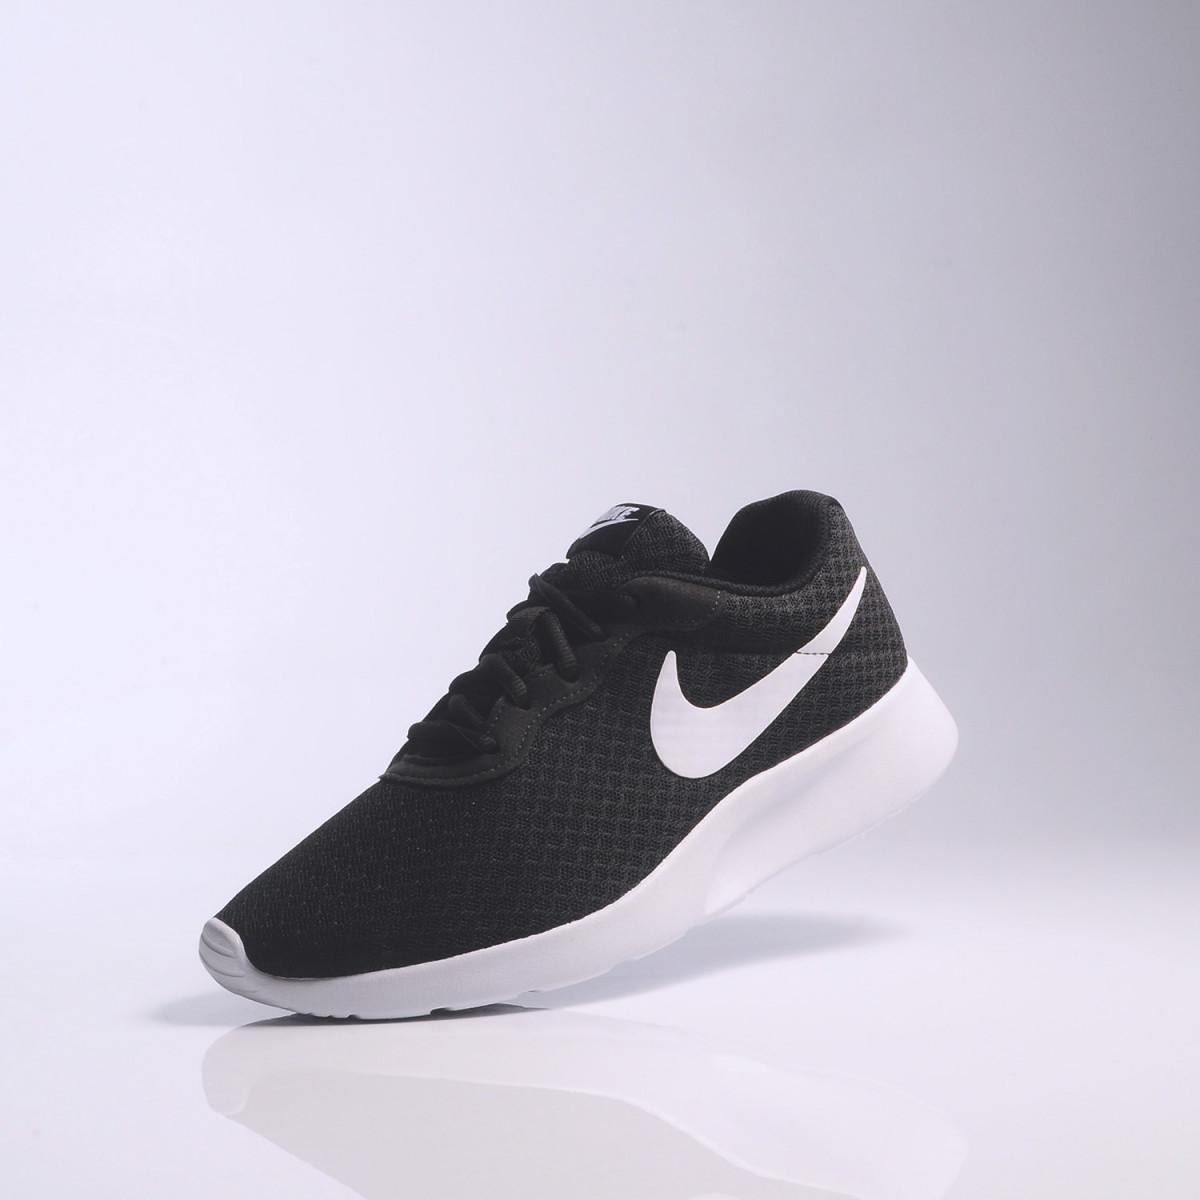 premium selection eb28c db37c Zapatillas Wmns Nike Tanjun - Nike % OFF